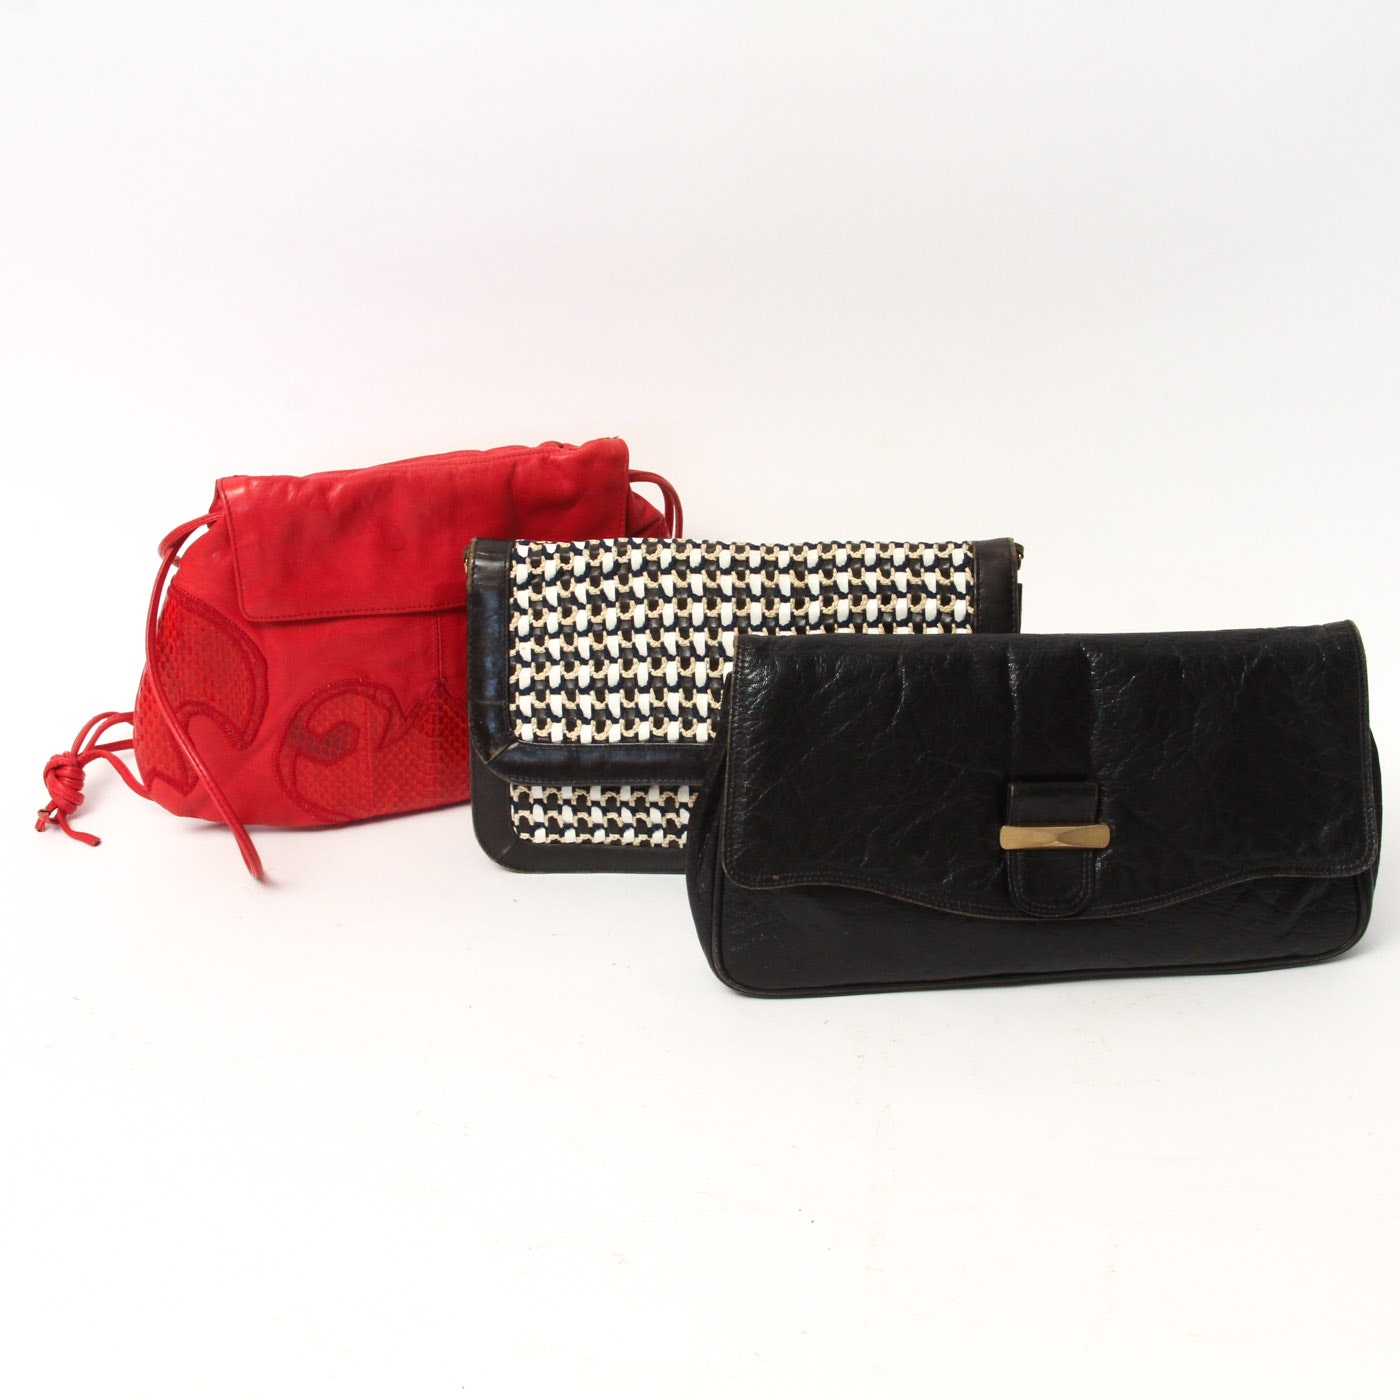 Collection of Vintage Handbags